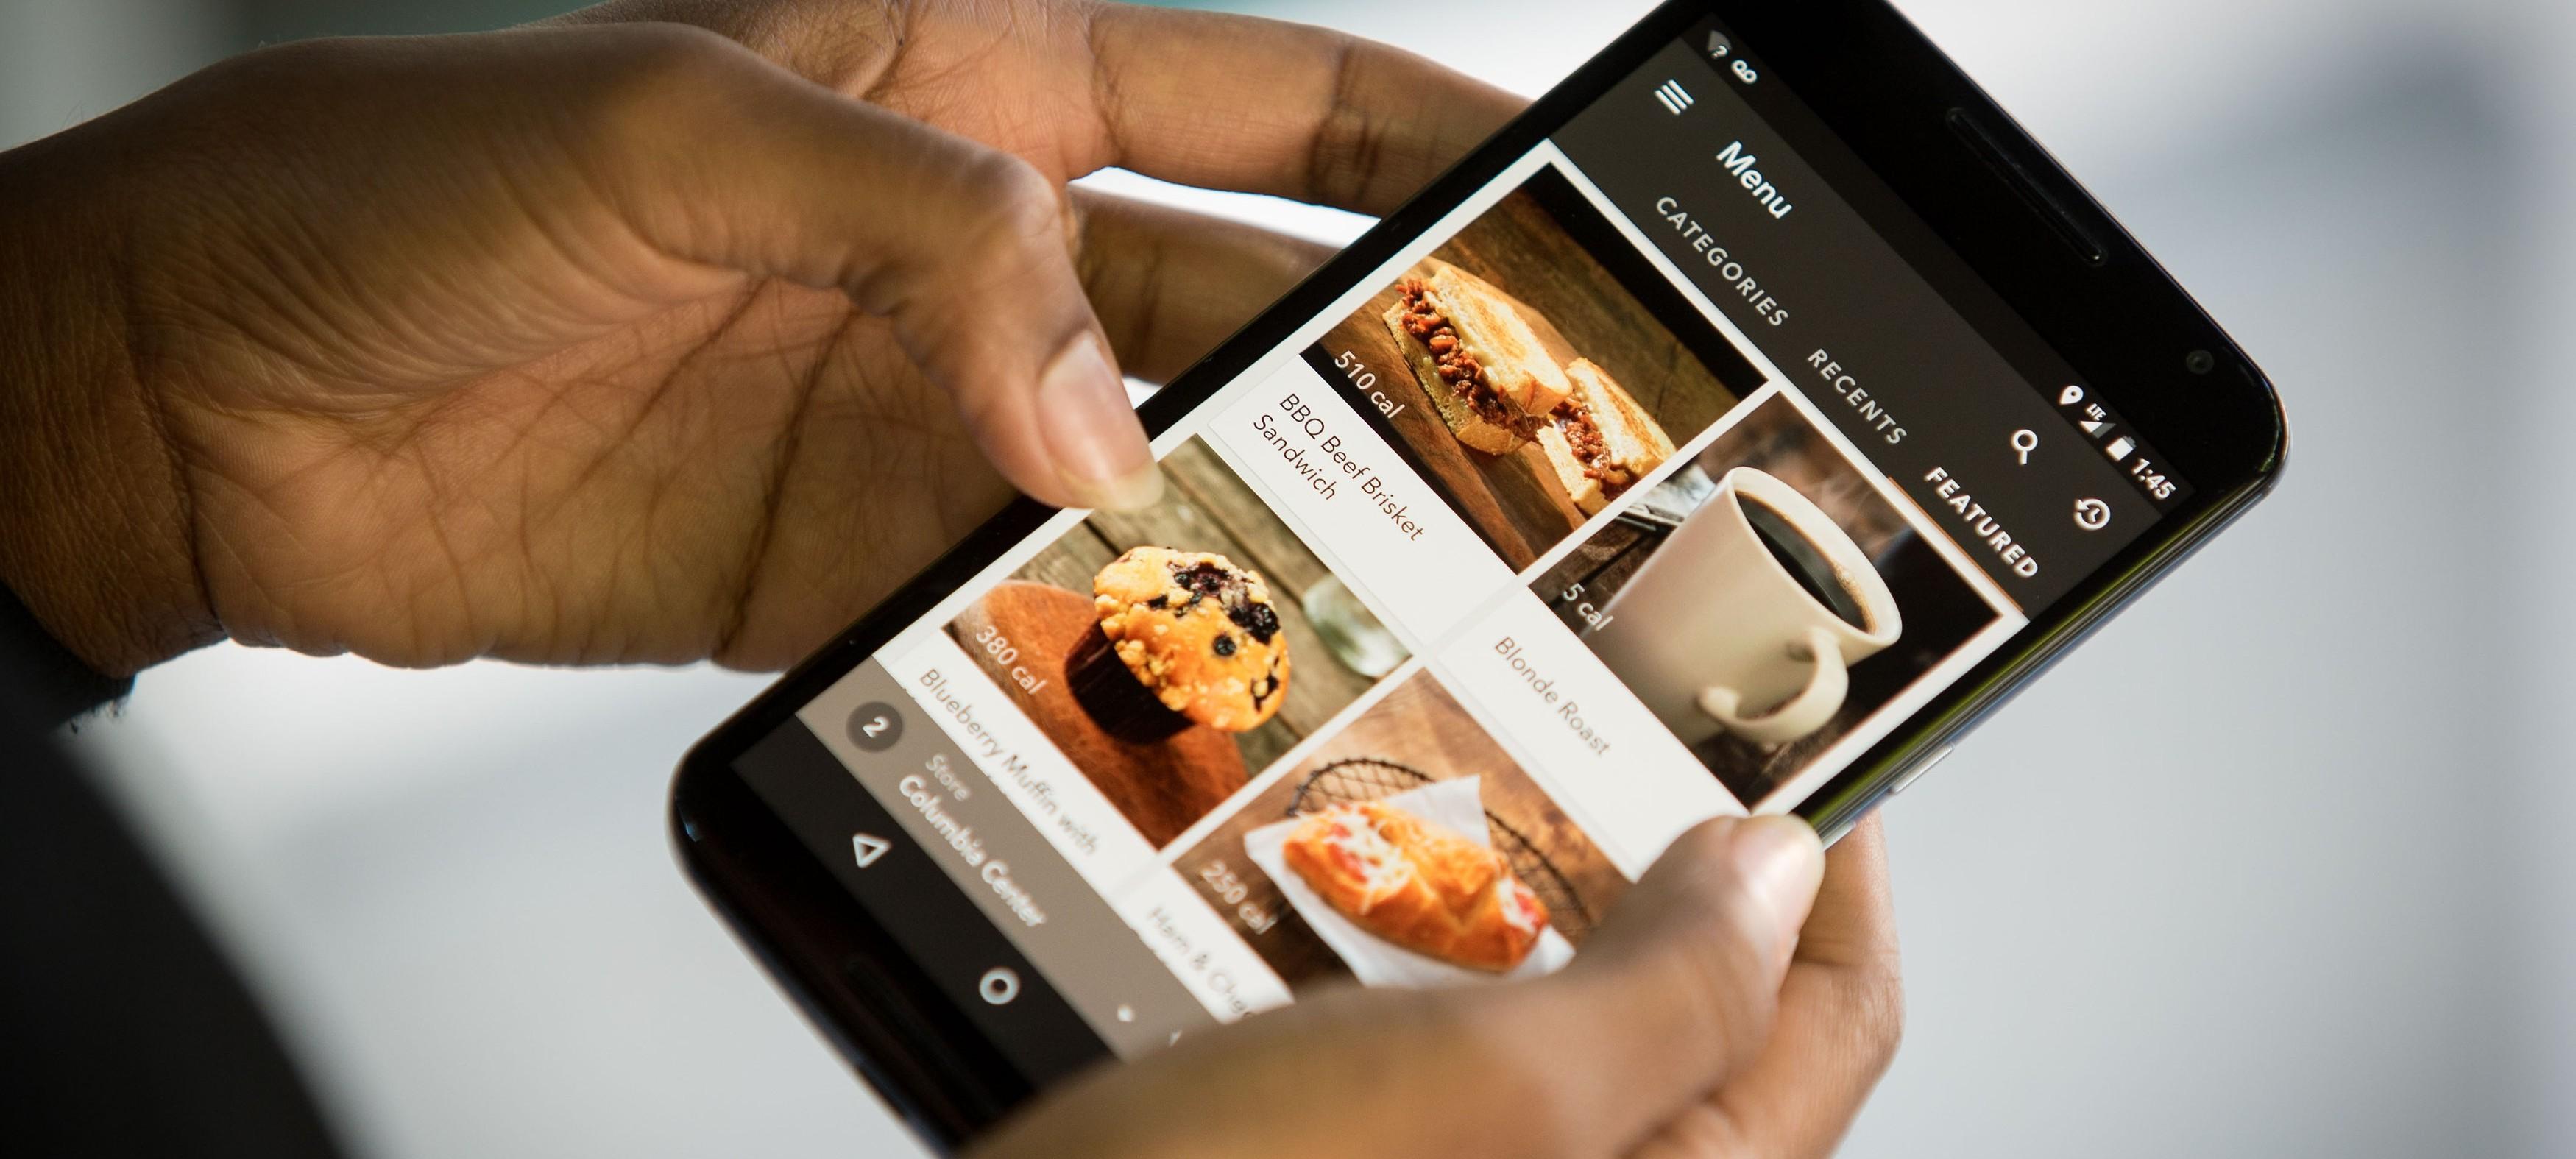 Starbucks Introducing a Virtual Barista Chatbot